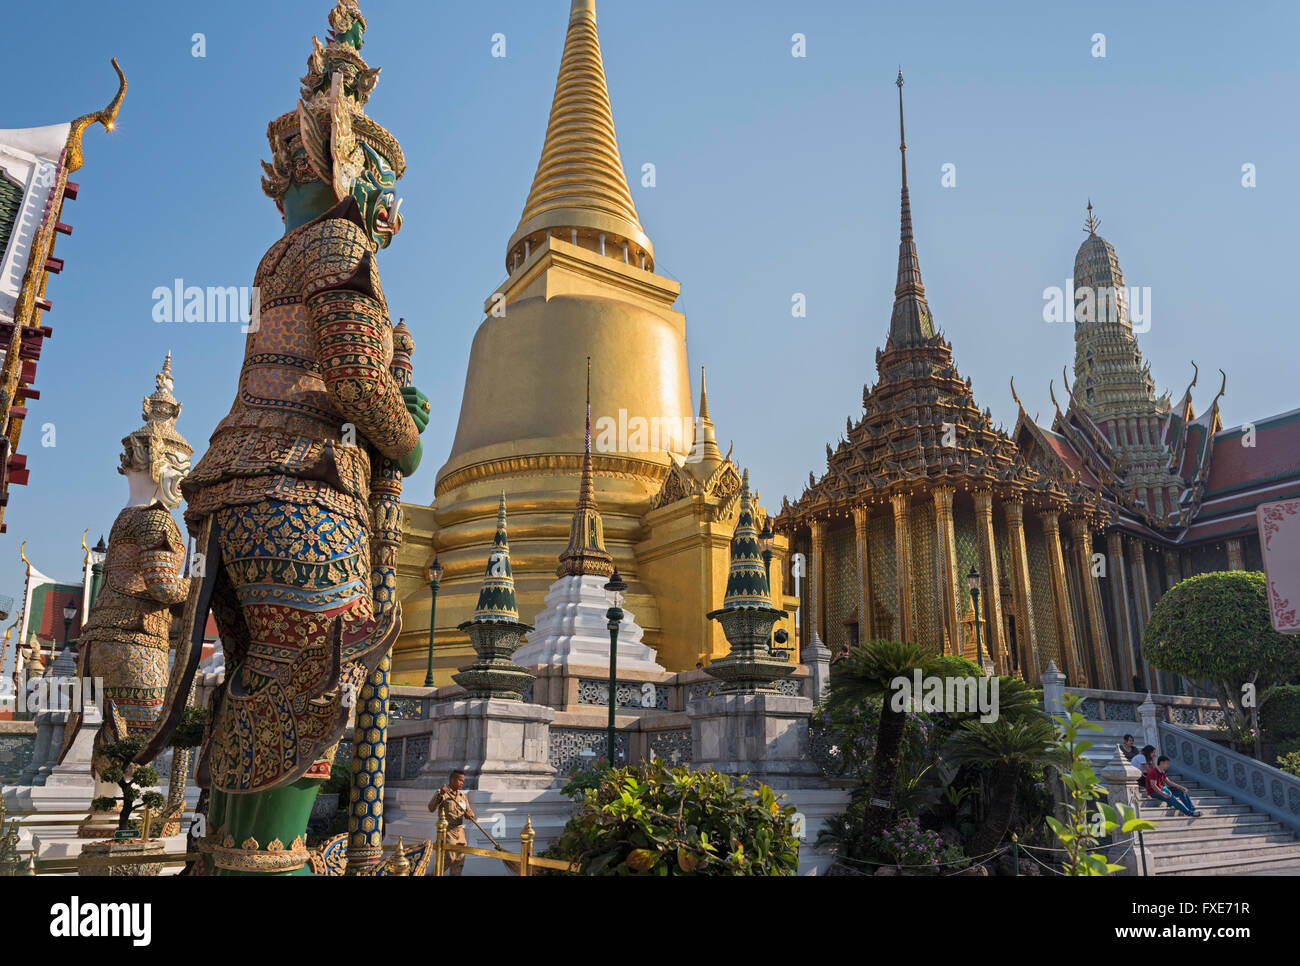 Il Wat Phra Kaew Grand Palace a Bangkok in Tailandia Immagini Stock